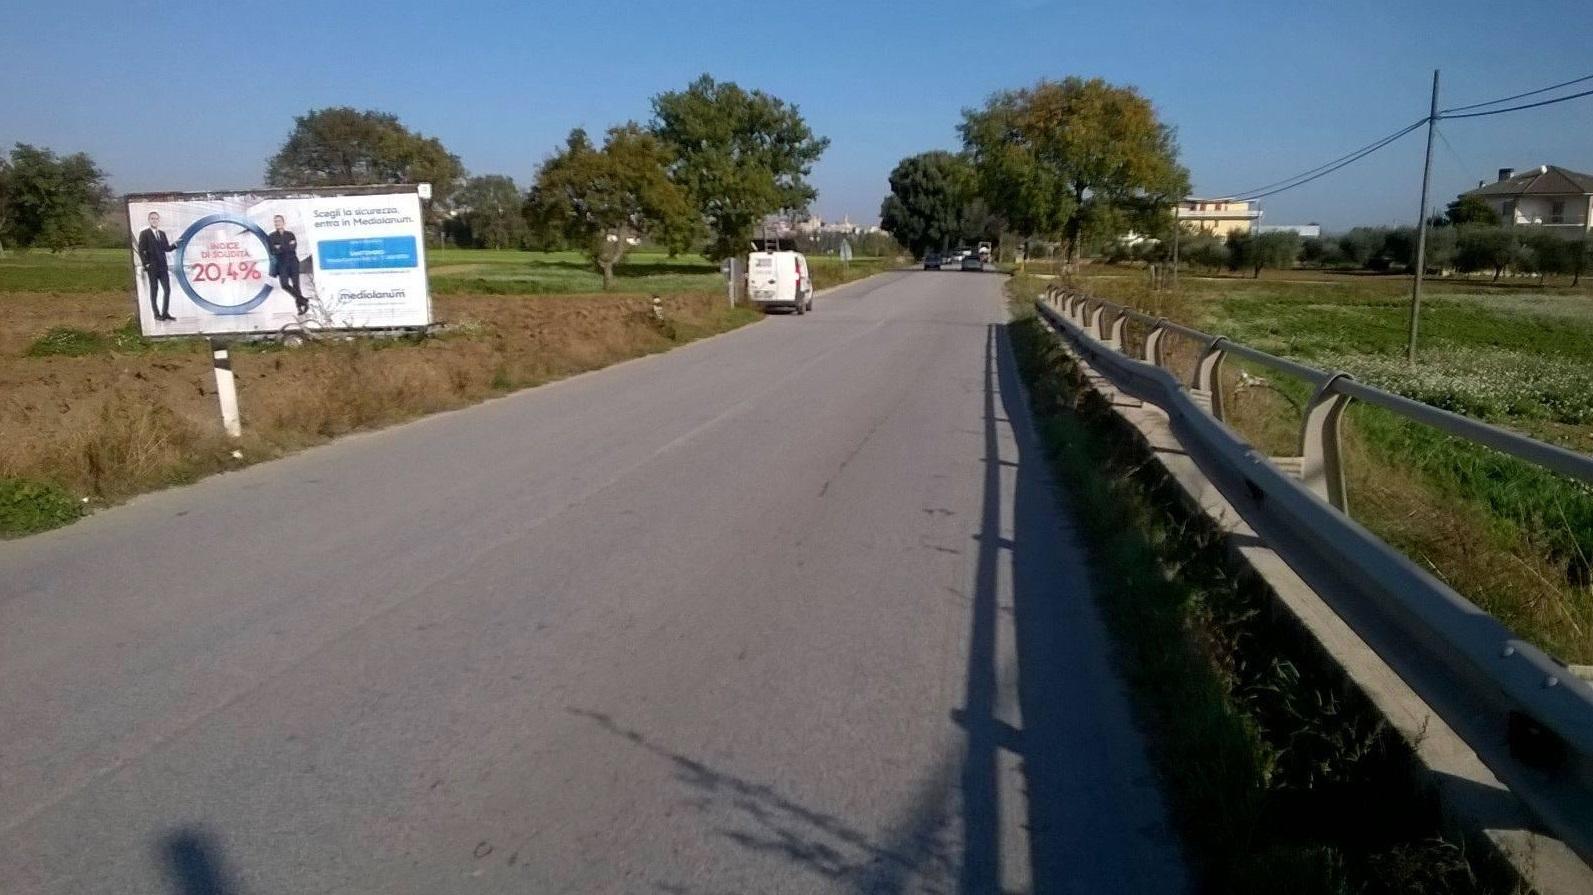 Cartellonistica Stradale Affissioni Val Vibrata – Sant'Omero Nereto Sant'Egidio